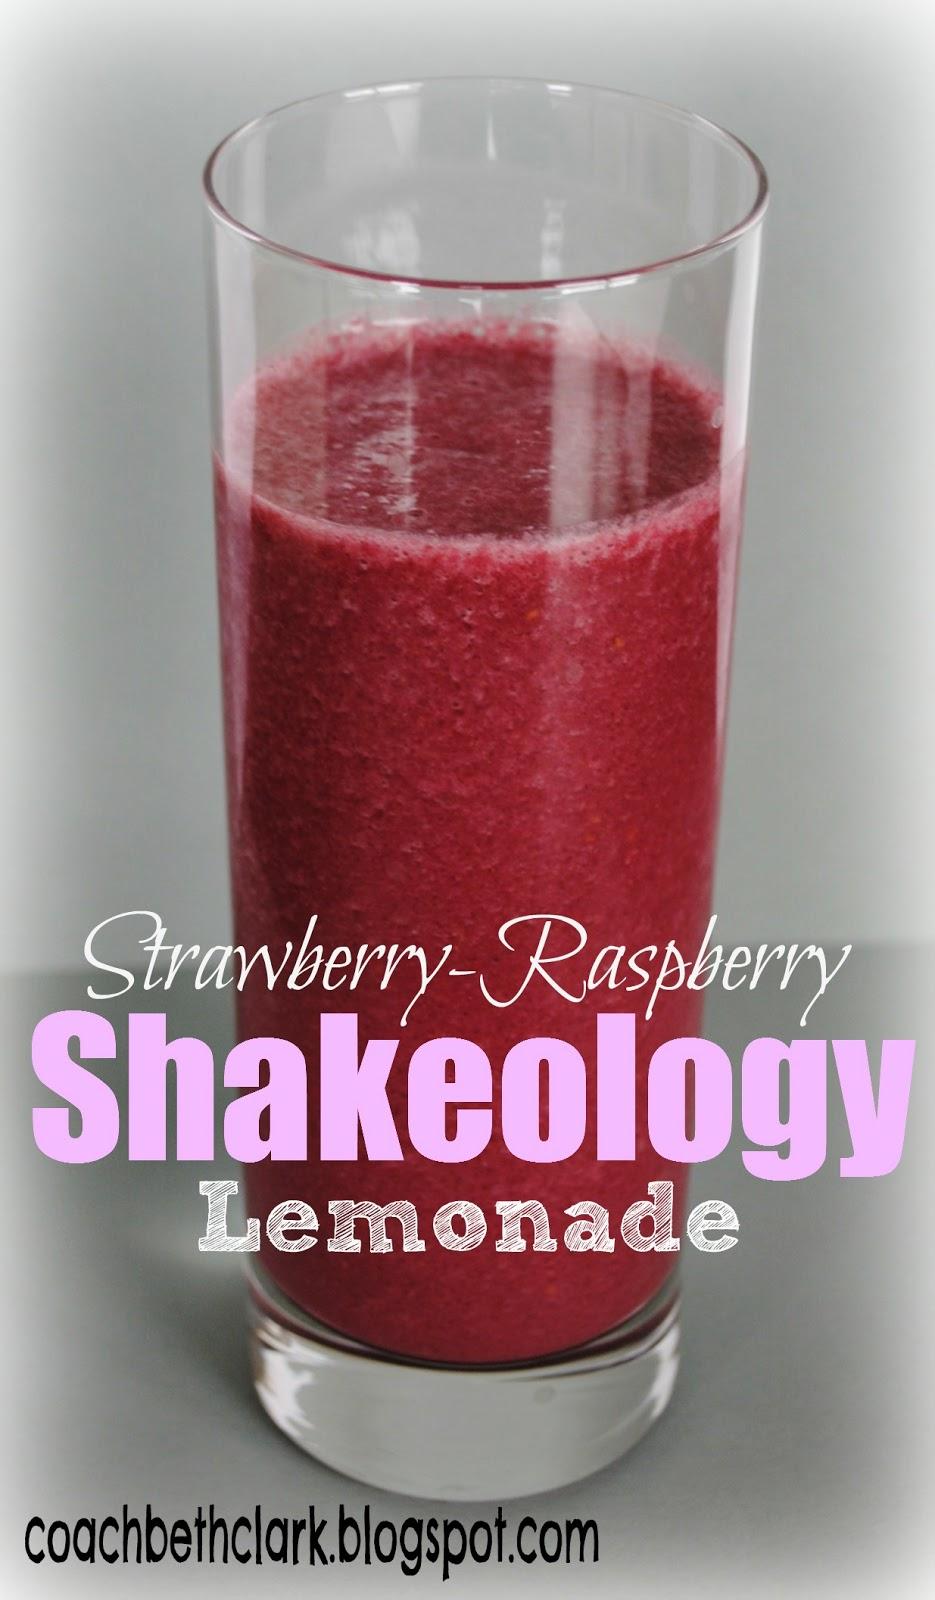 Body Remodel Fuel Your Body Friday Pink Lemonade Shakeology